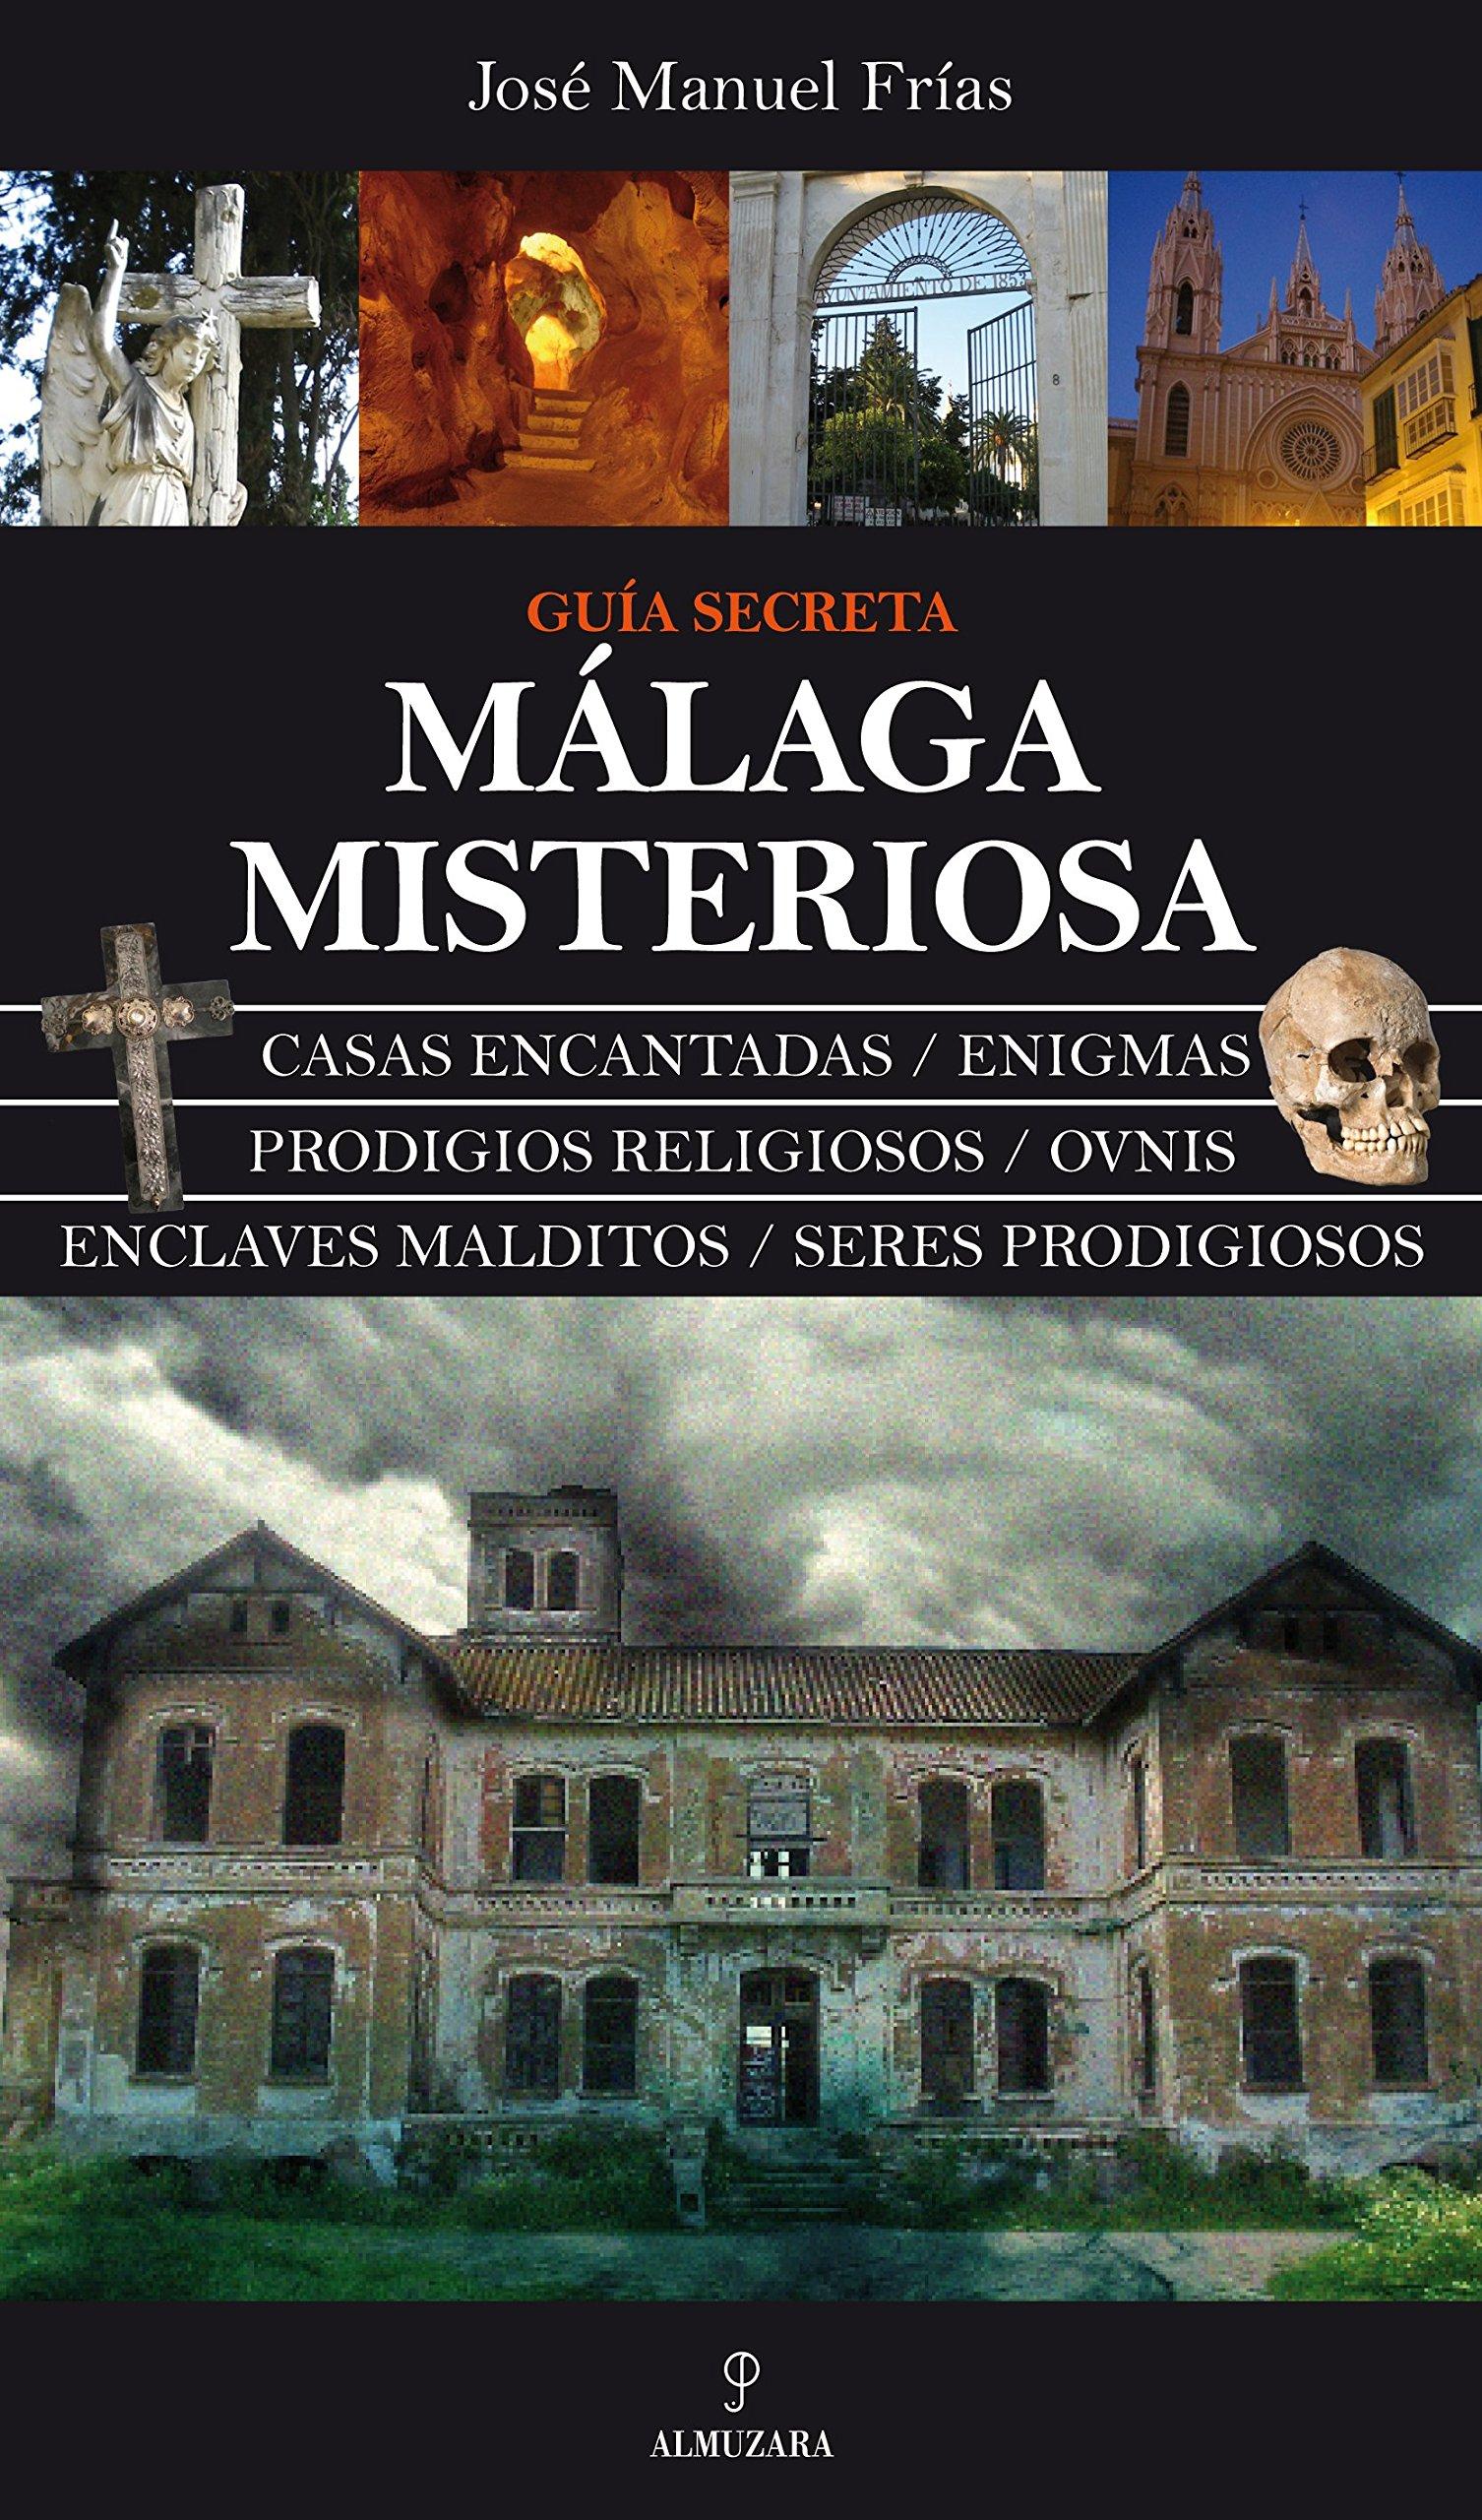 Málaga misteriosa: Guía secreta (Magica (almuzara)): Amazon.es: Frías Ciruela , José Manuel: Libros